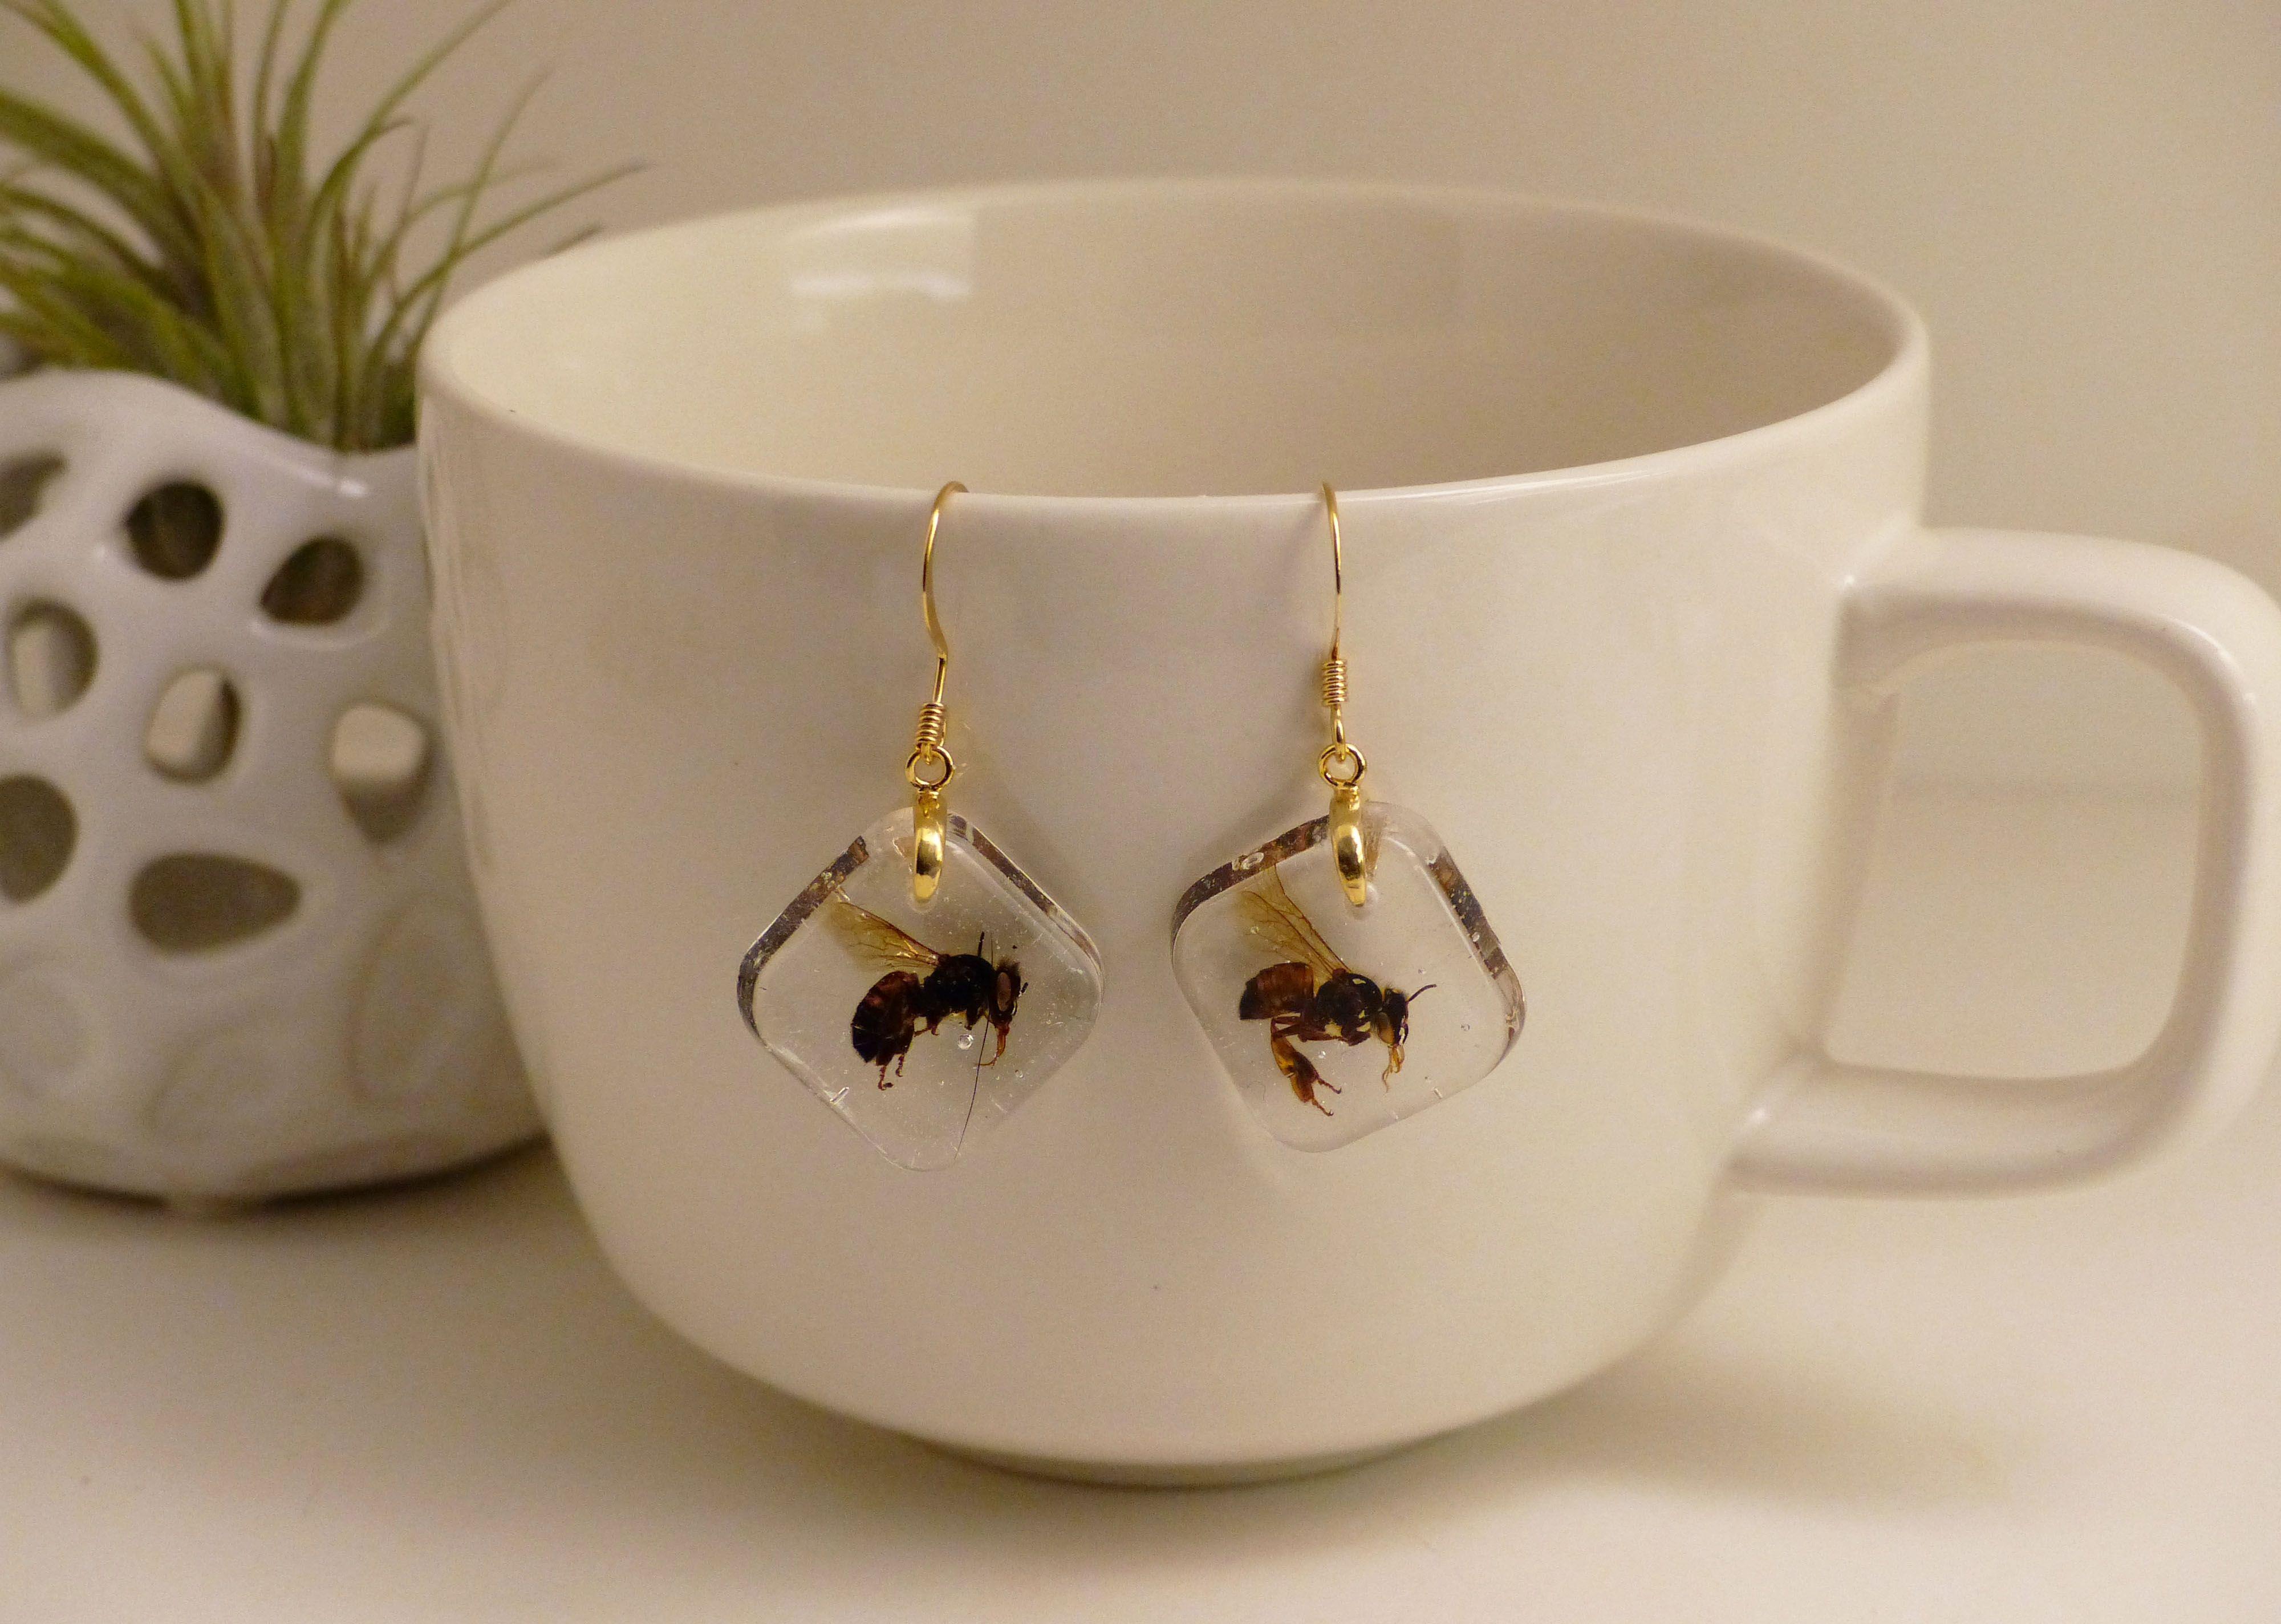 Real Honey Bee Earrings By Ocelli Creations